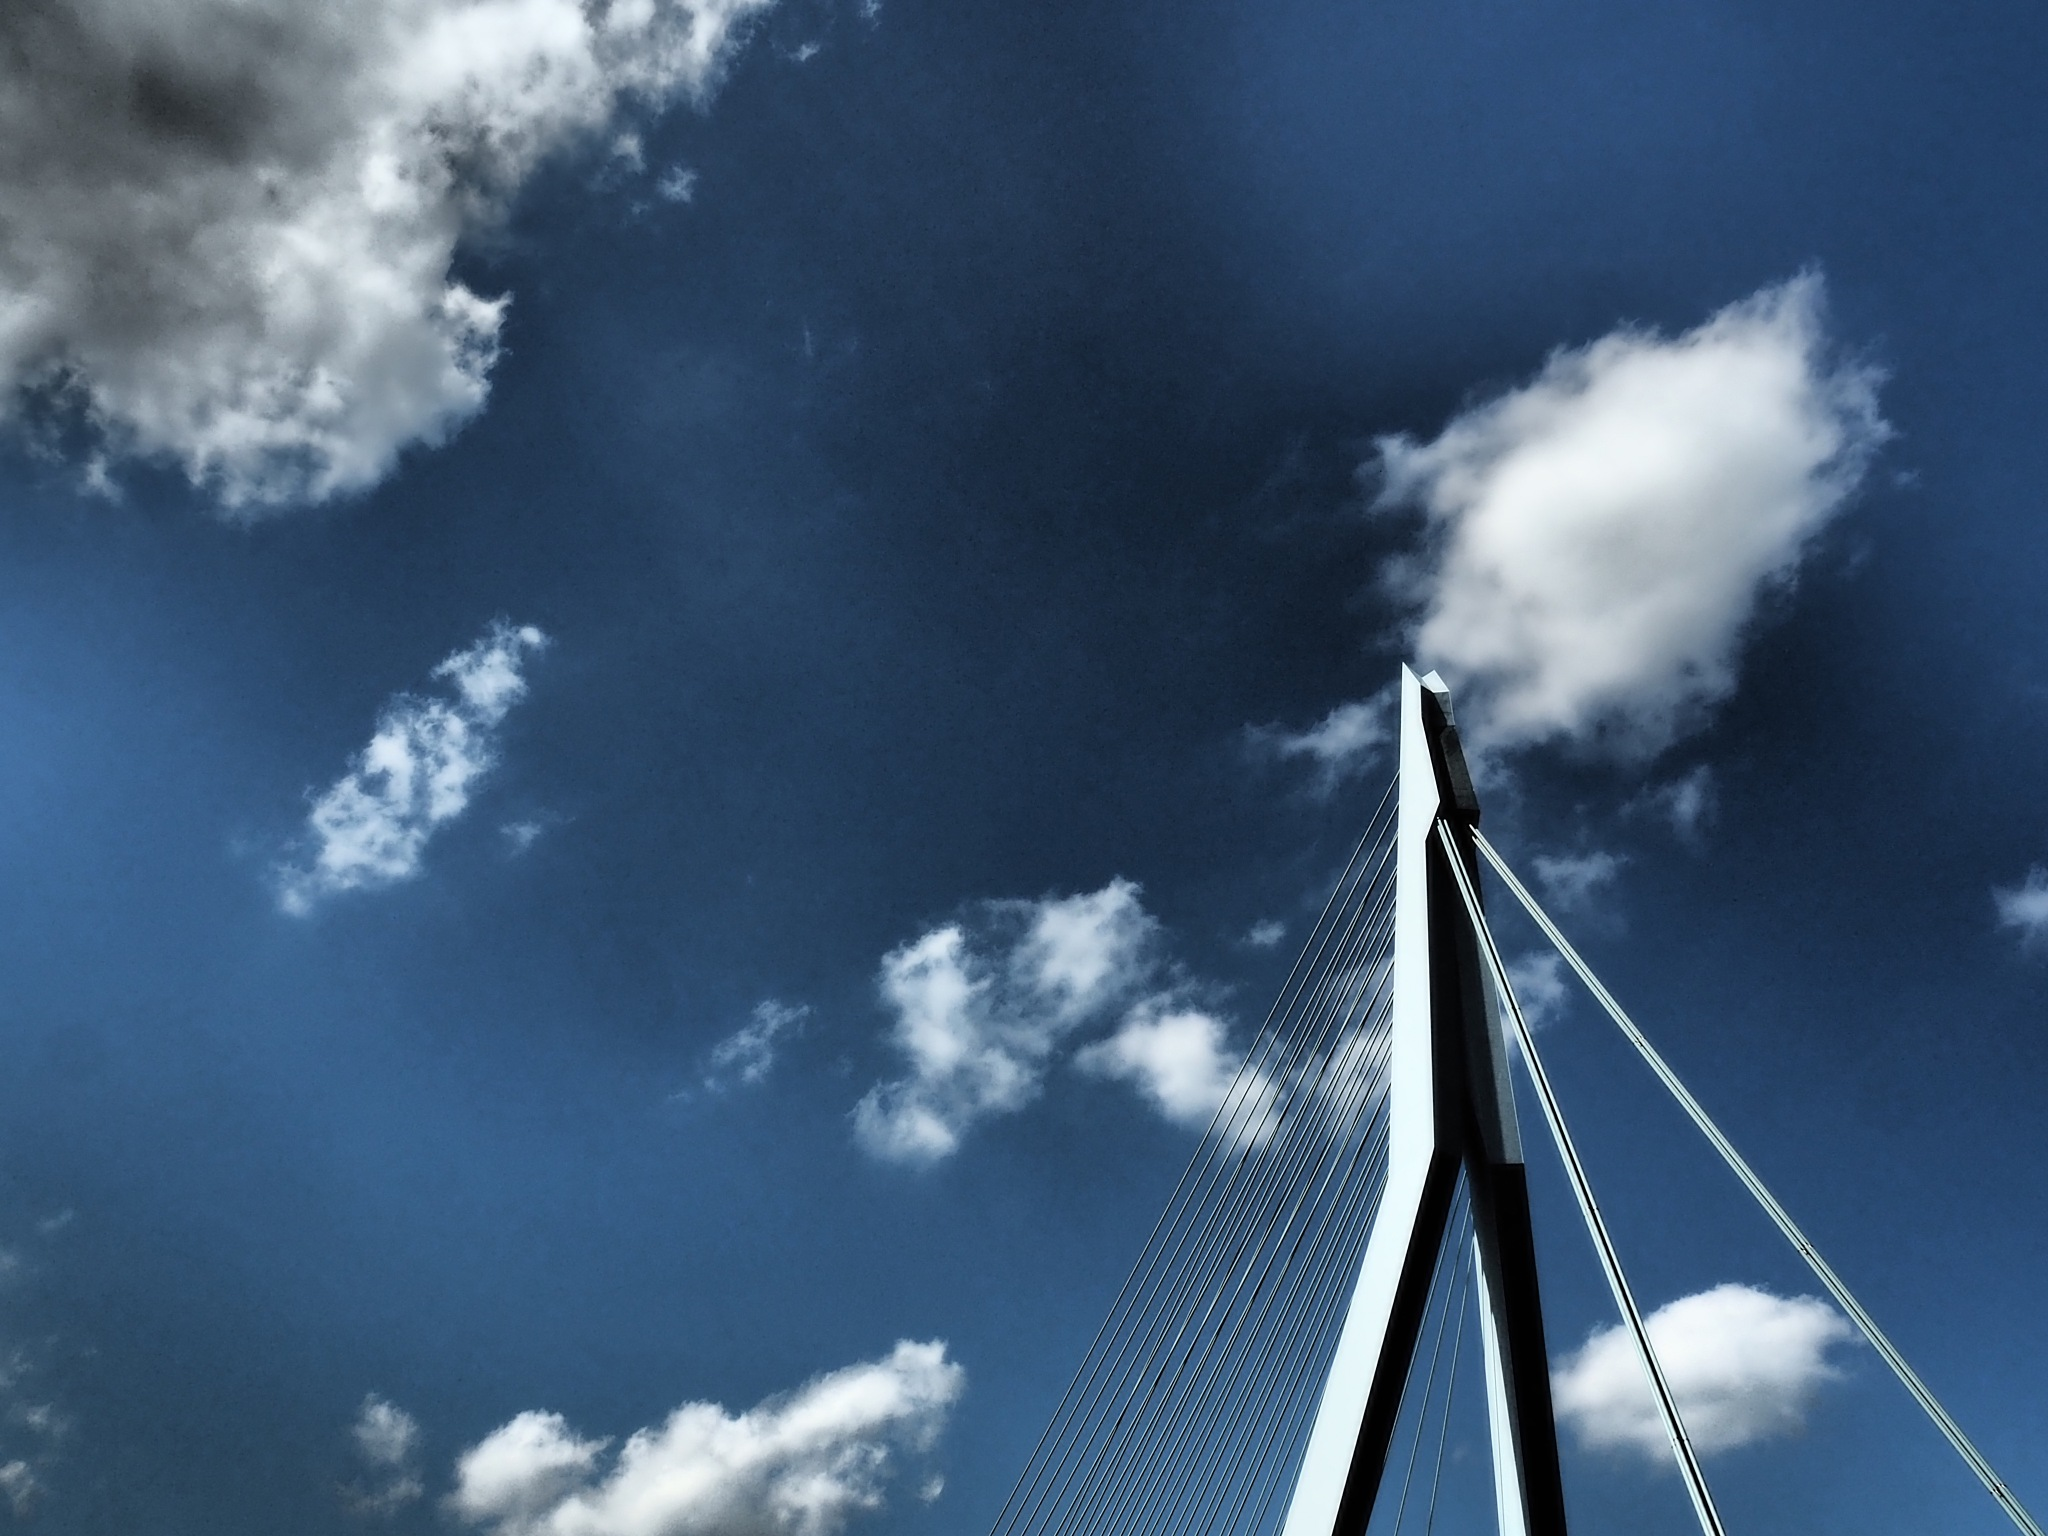 Rotterdam by Teo Stuivenberg